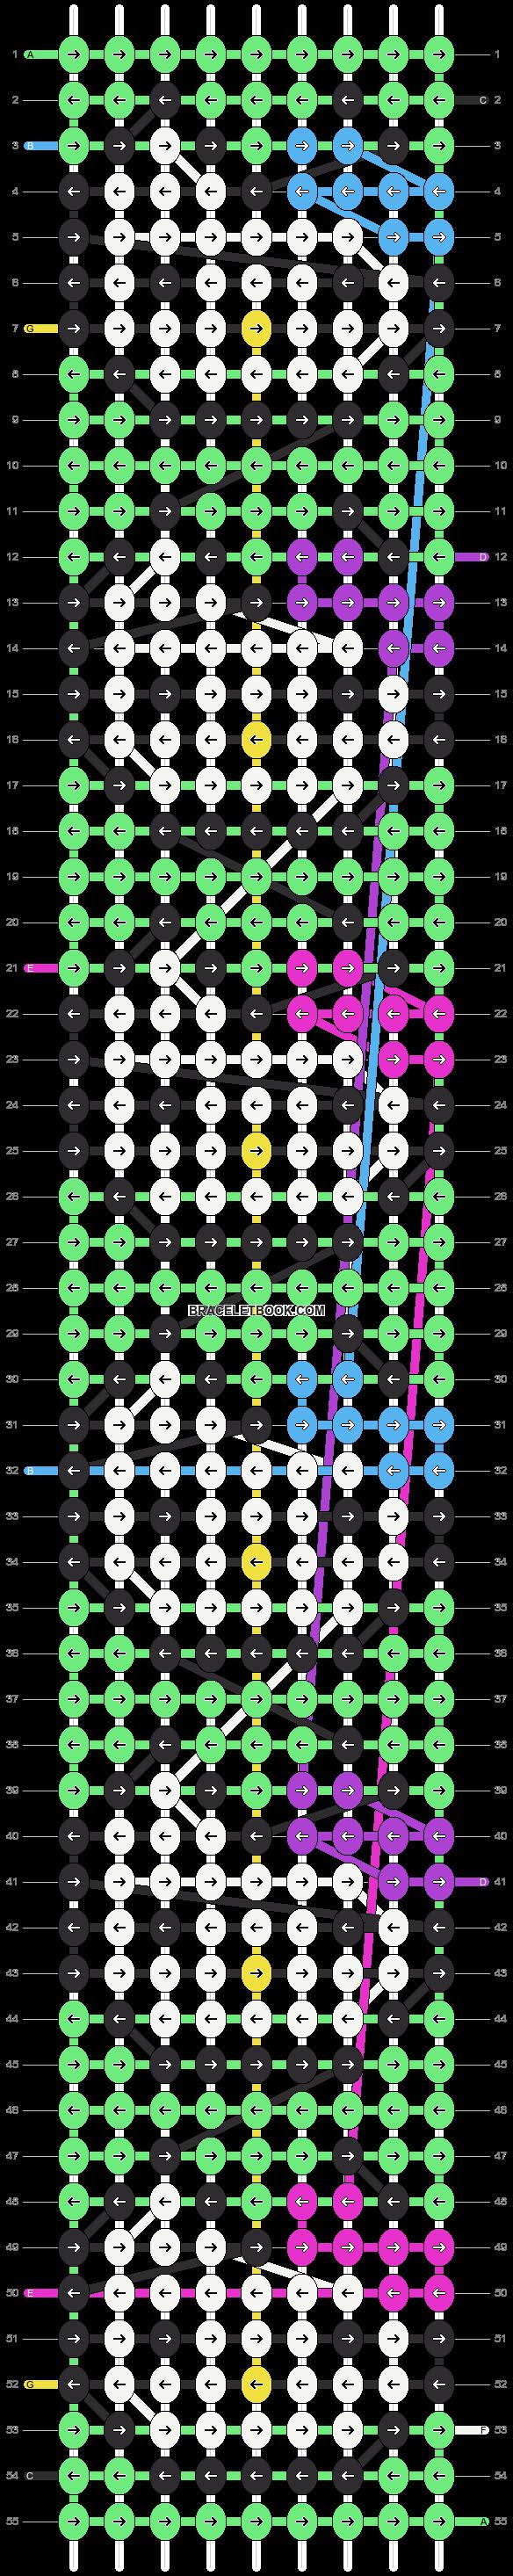 Alpha pattern #15170 pattern